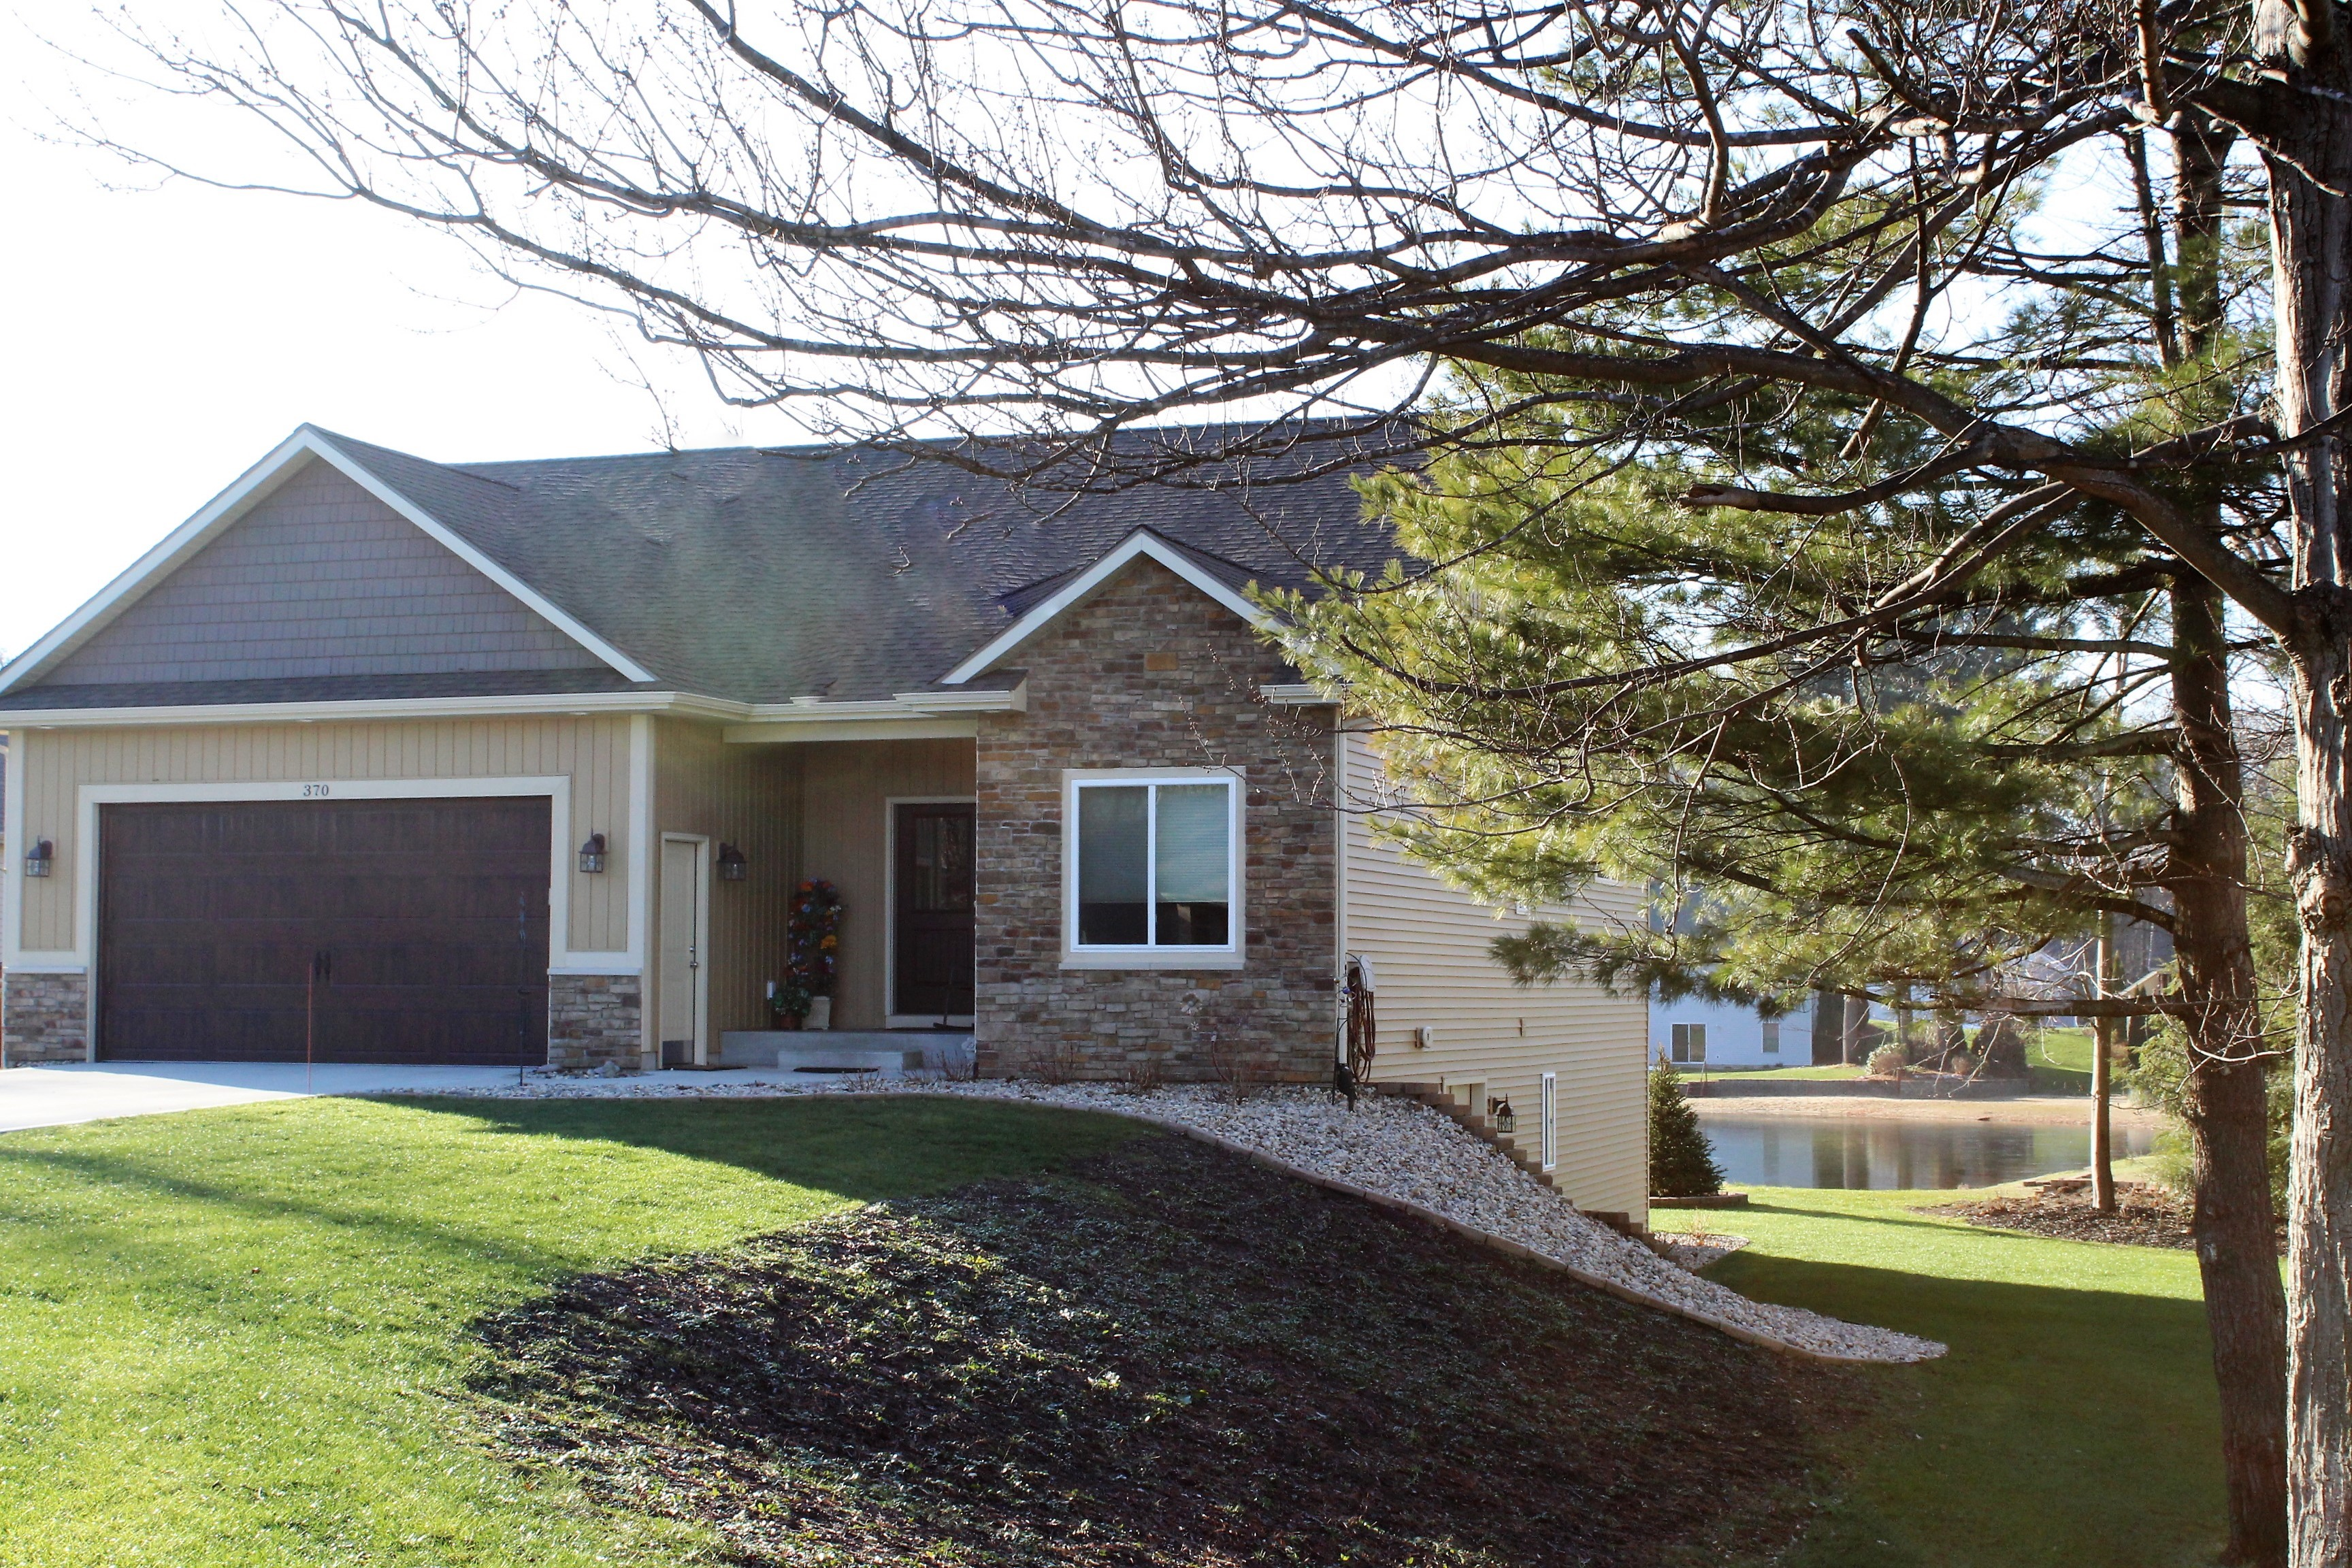 其它住宅 为 销售 在 Secluded Life on the Lake 370 142nd Avenue 霍德兰, 密歇根州, 49424 美国